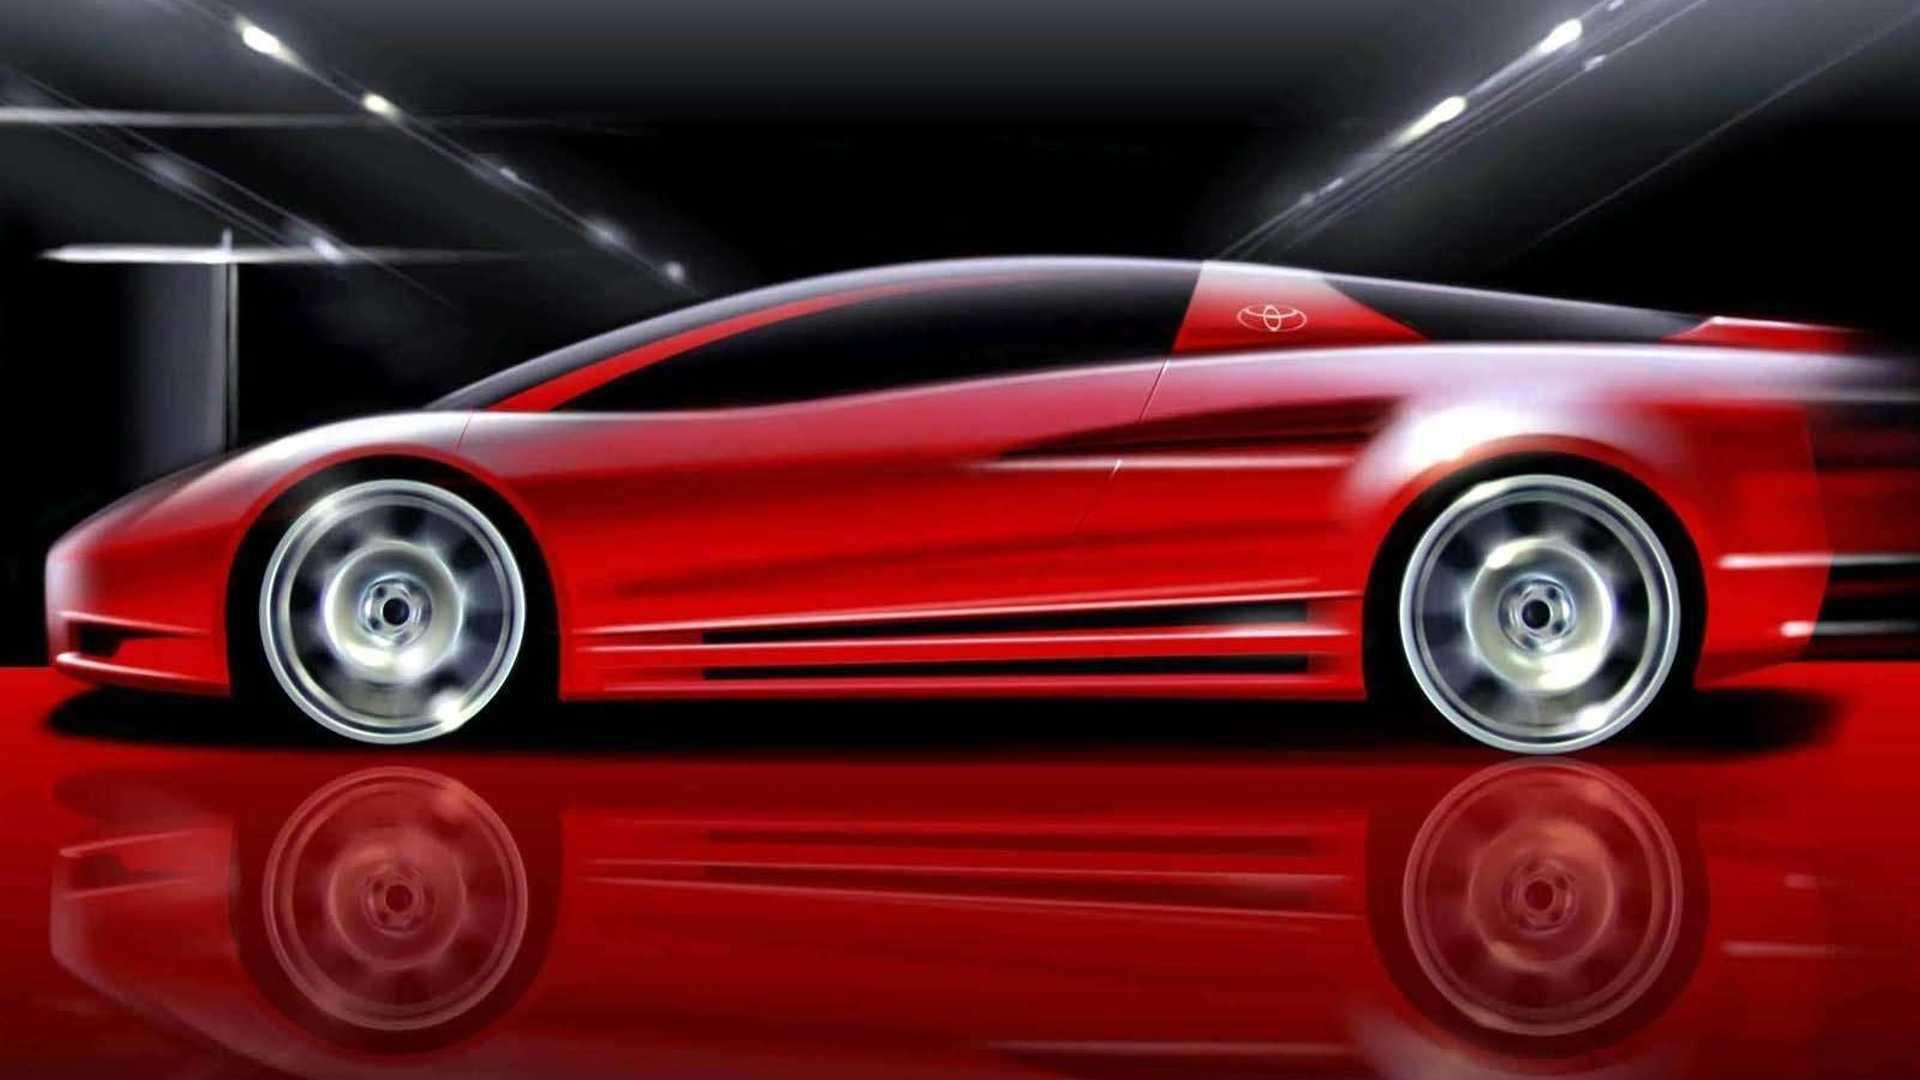 Toyota-Alessandro-Volta-concept-2004-26